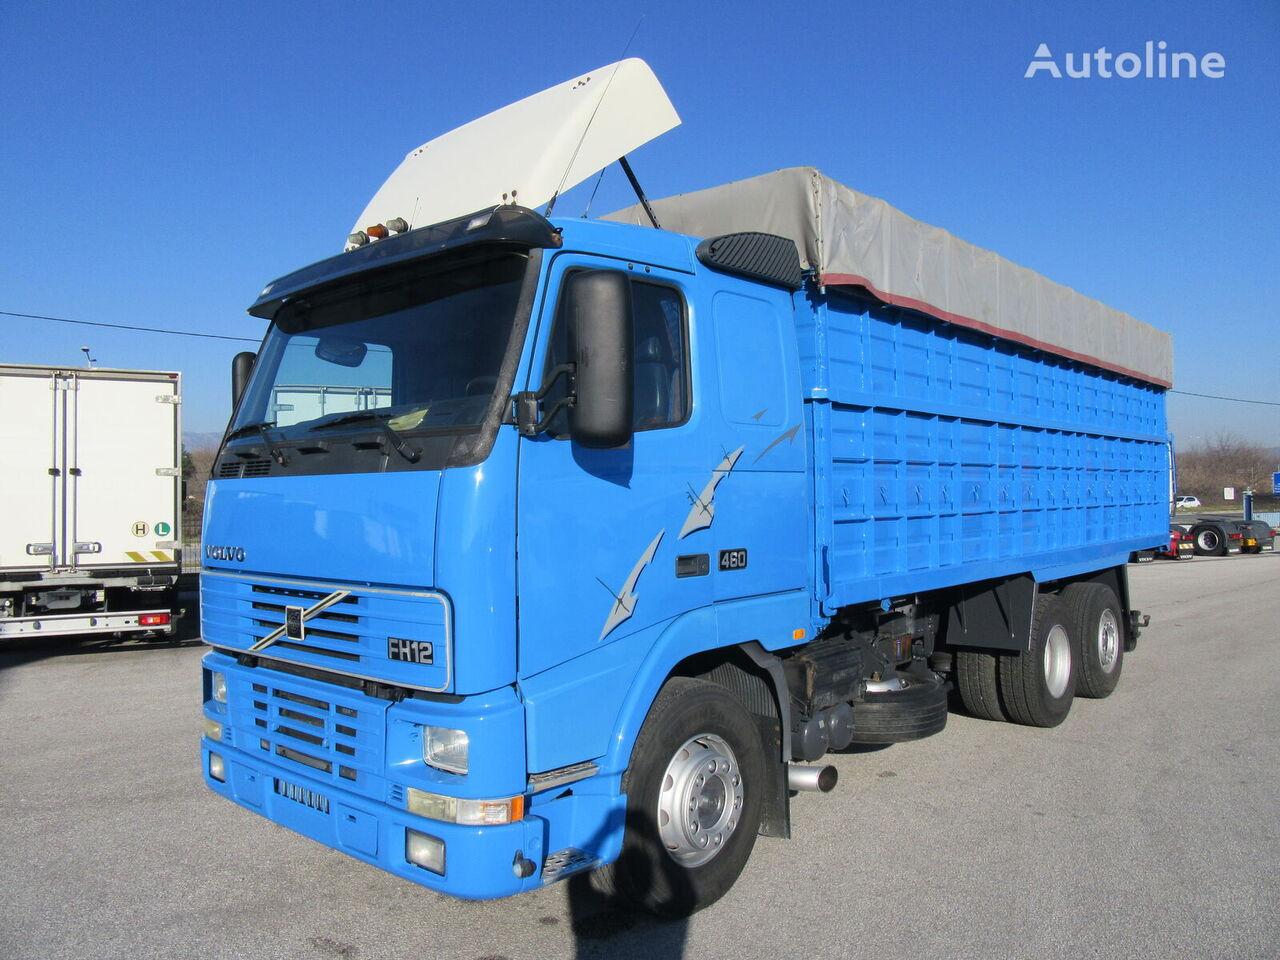 VOLVO FH 12 460 6X2 / EMPORHOANATRHOPE dump truck